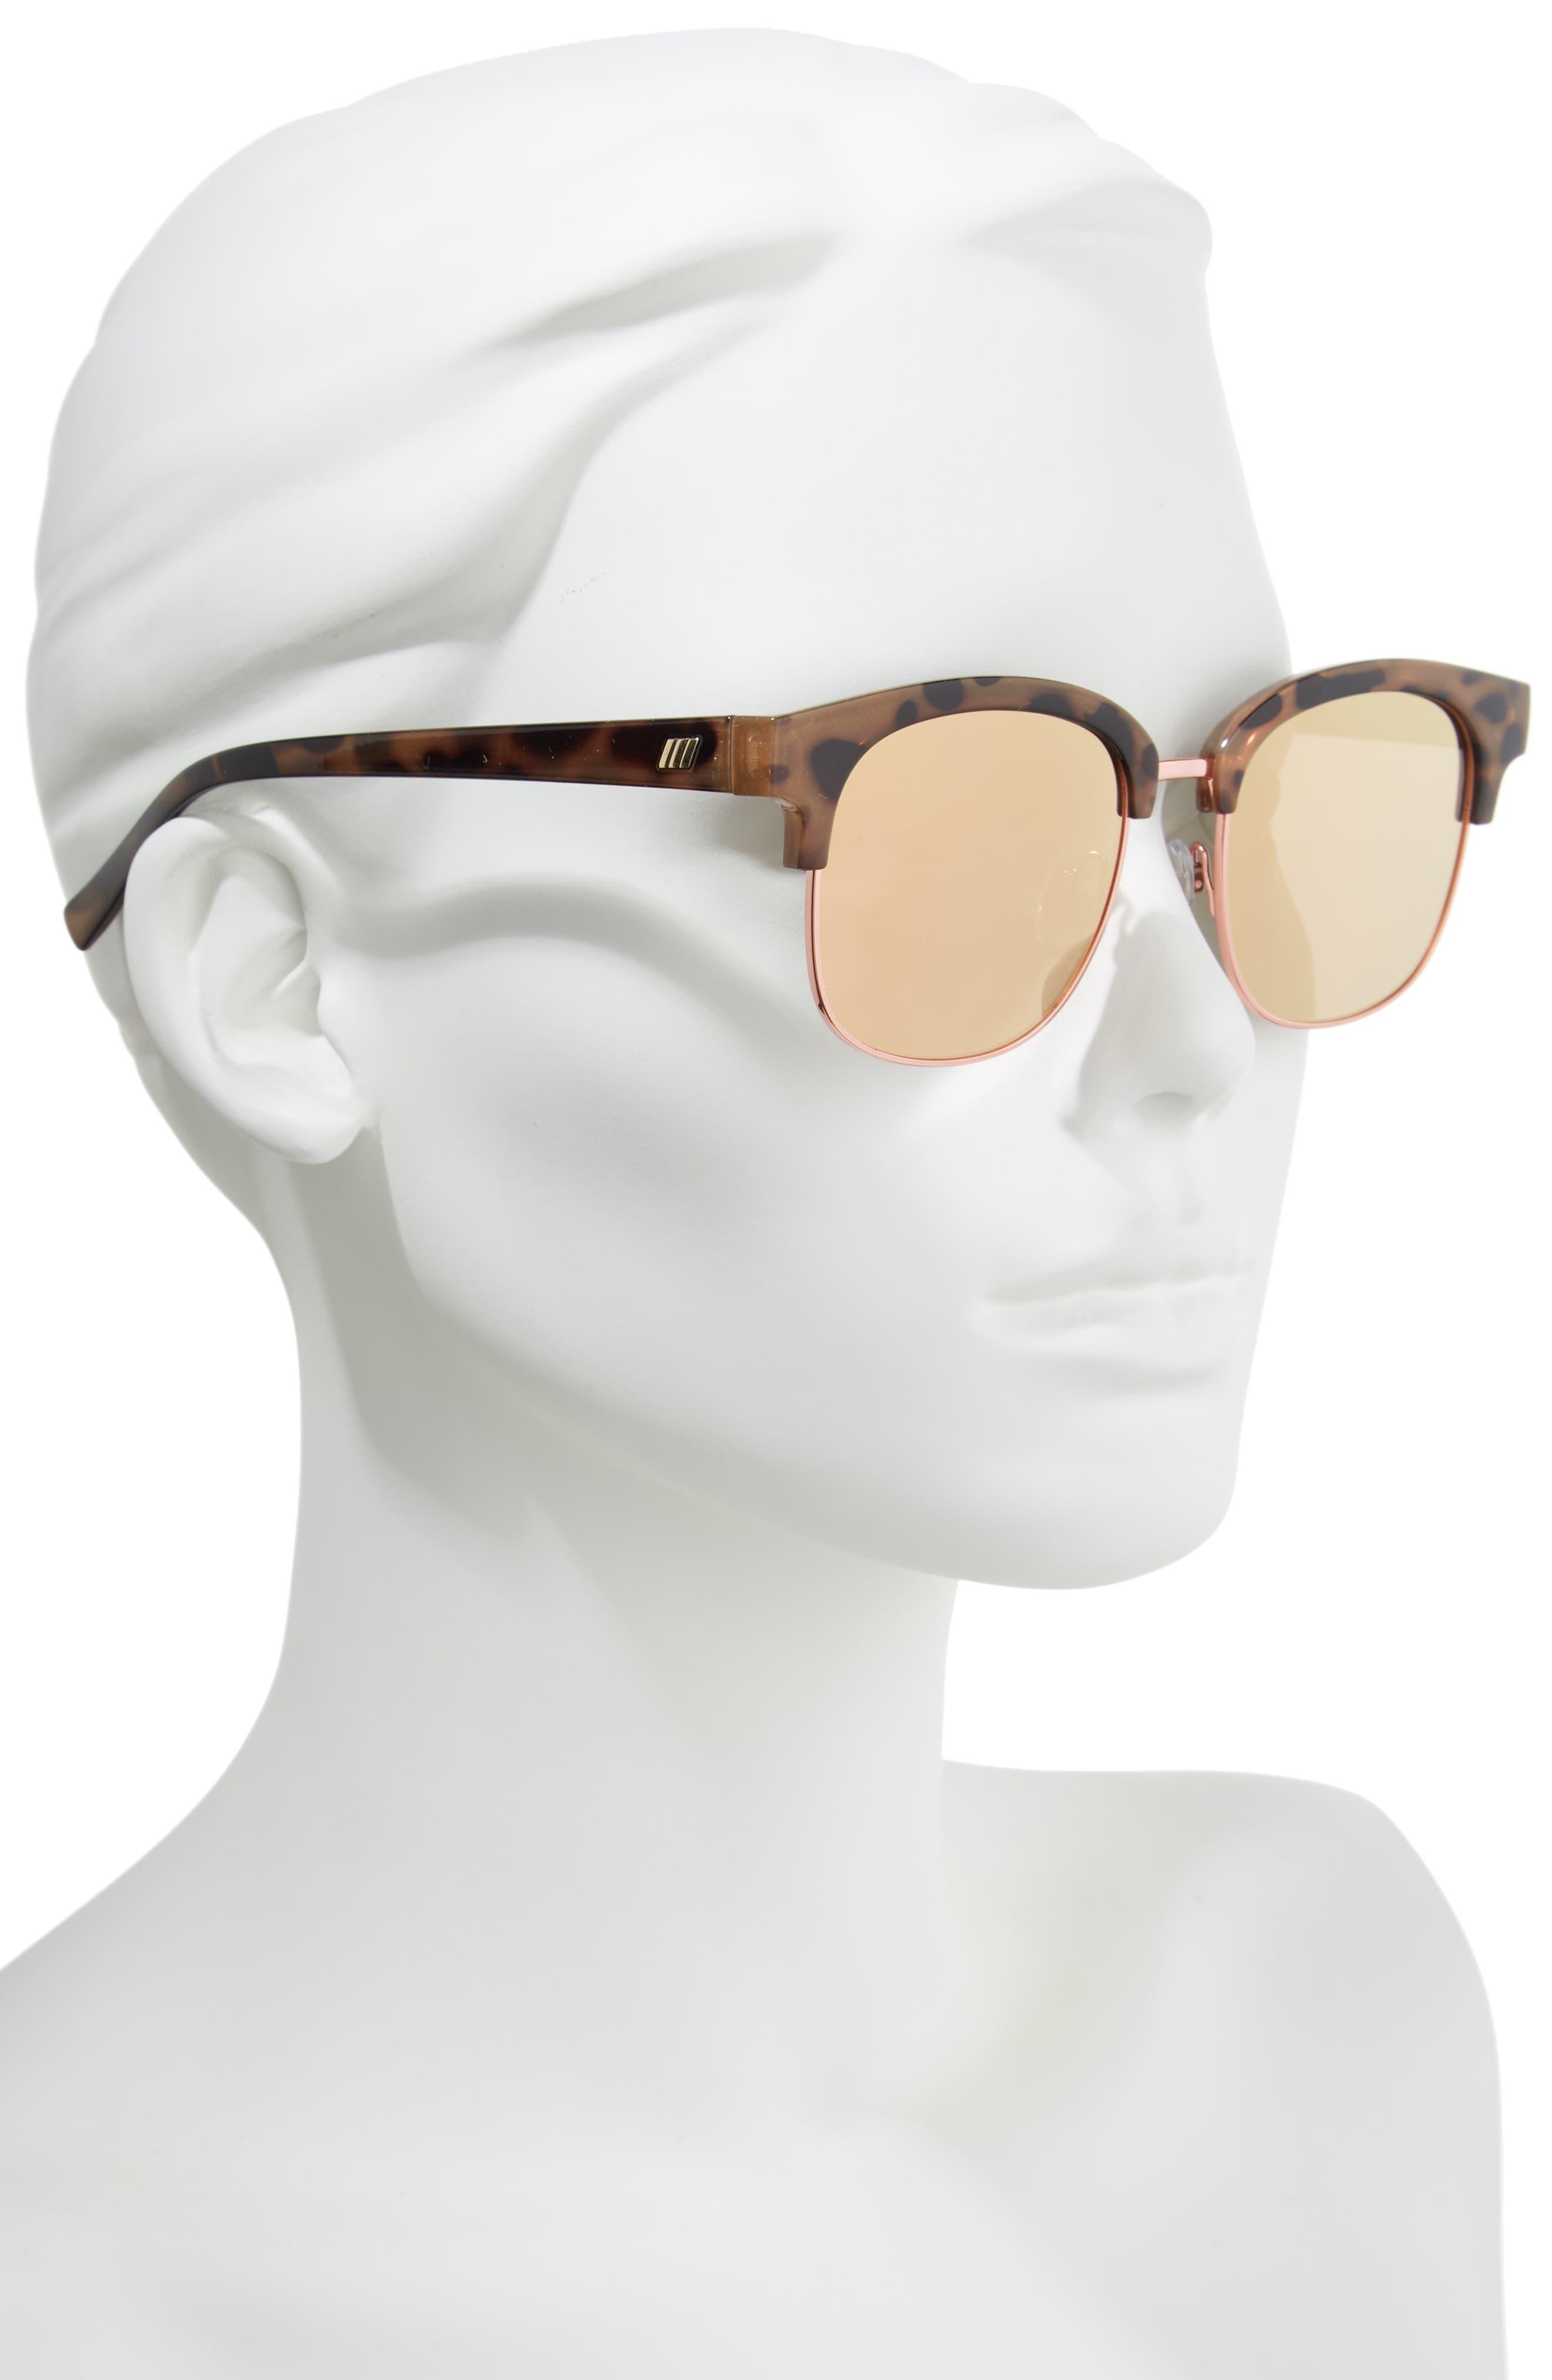 Recognition 53mm Sunglasses,                             Alternate thumbnail 2, color,                             Apricot Tortoise